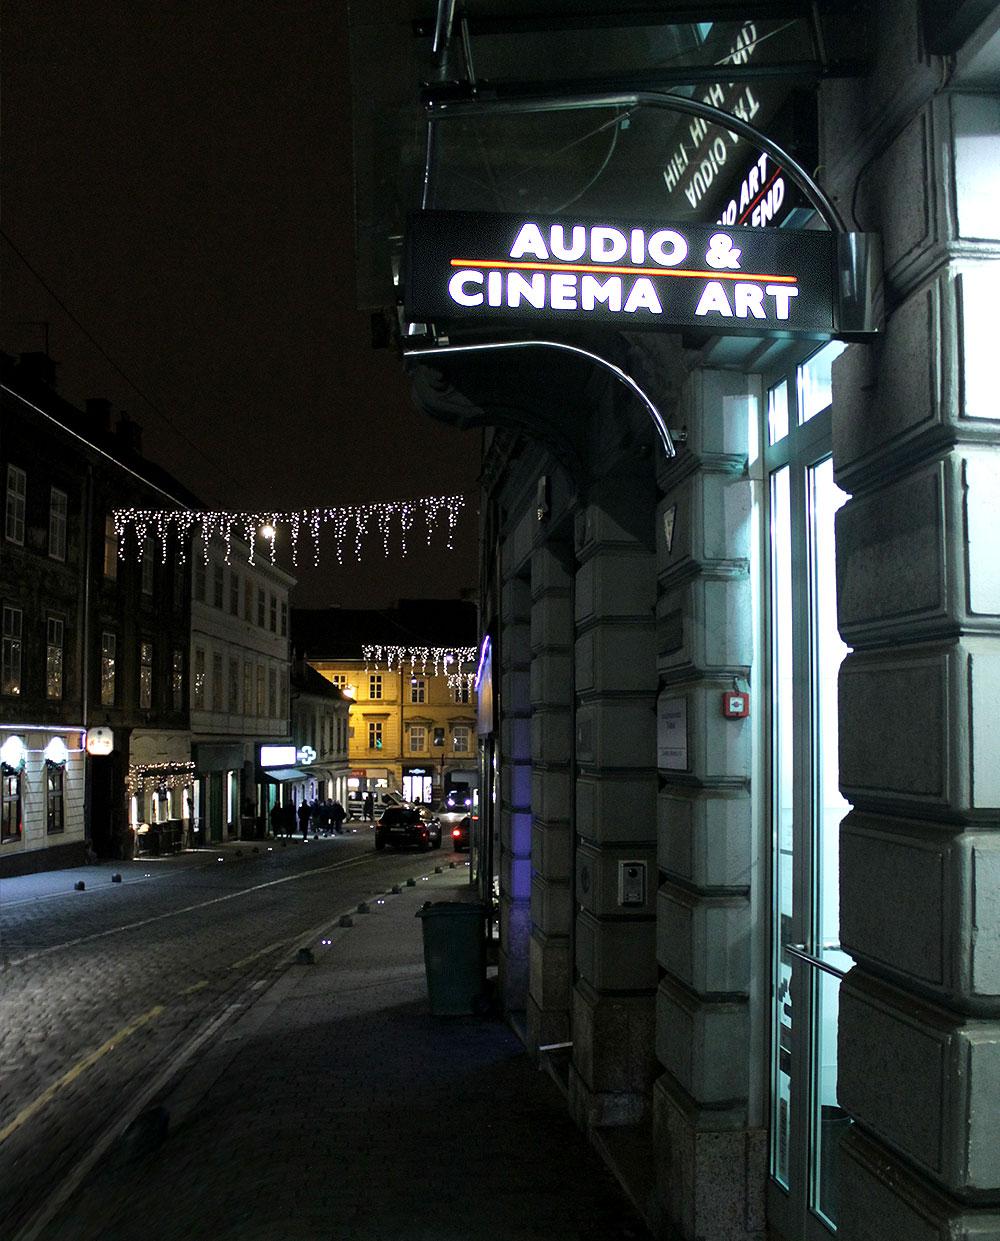 audiocinema-art-trgovina-03